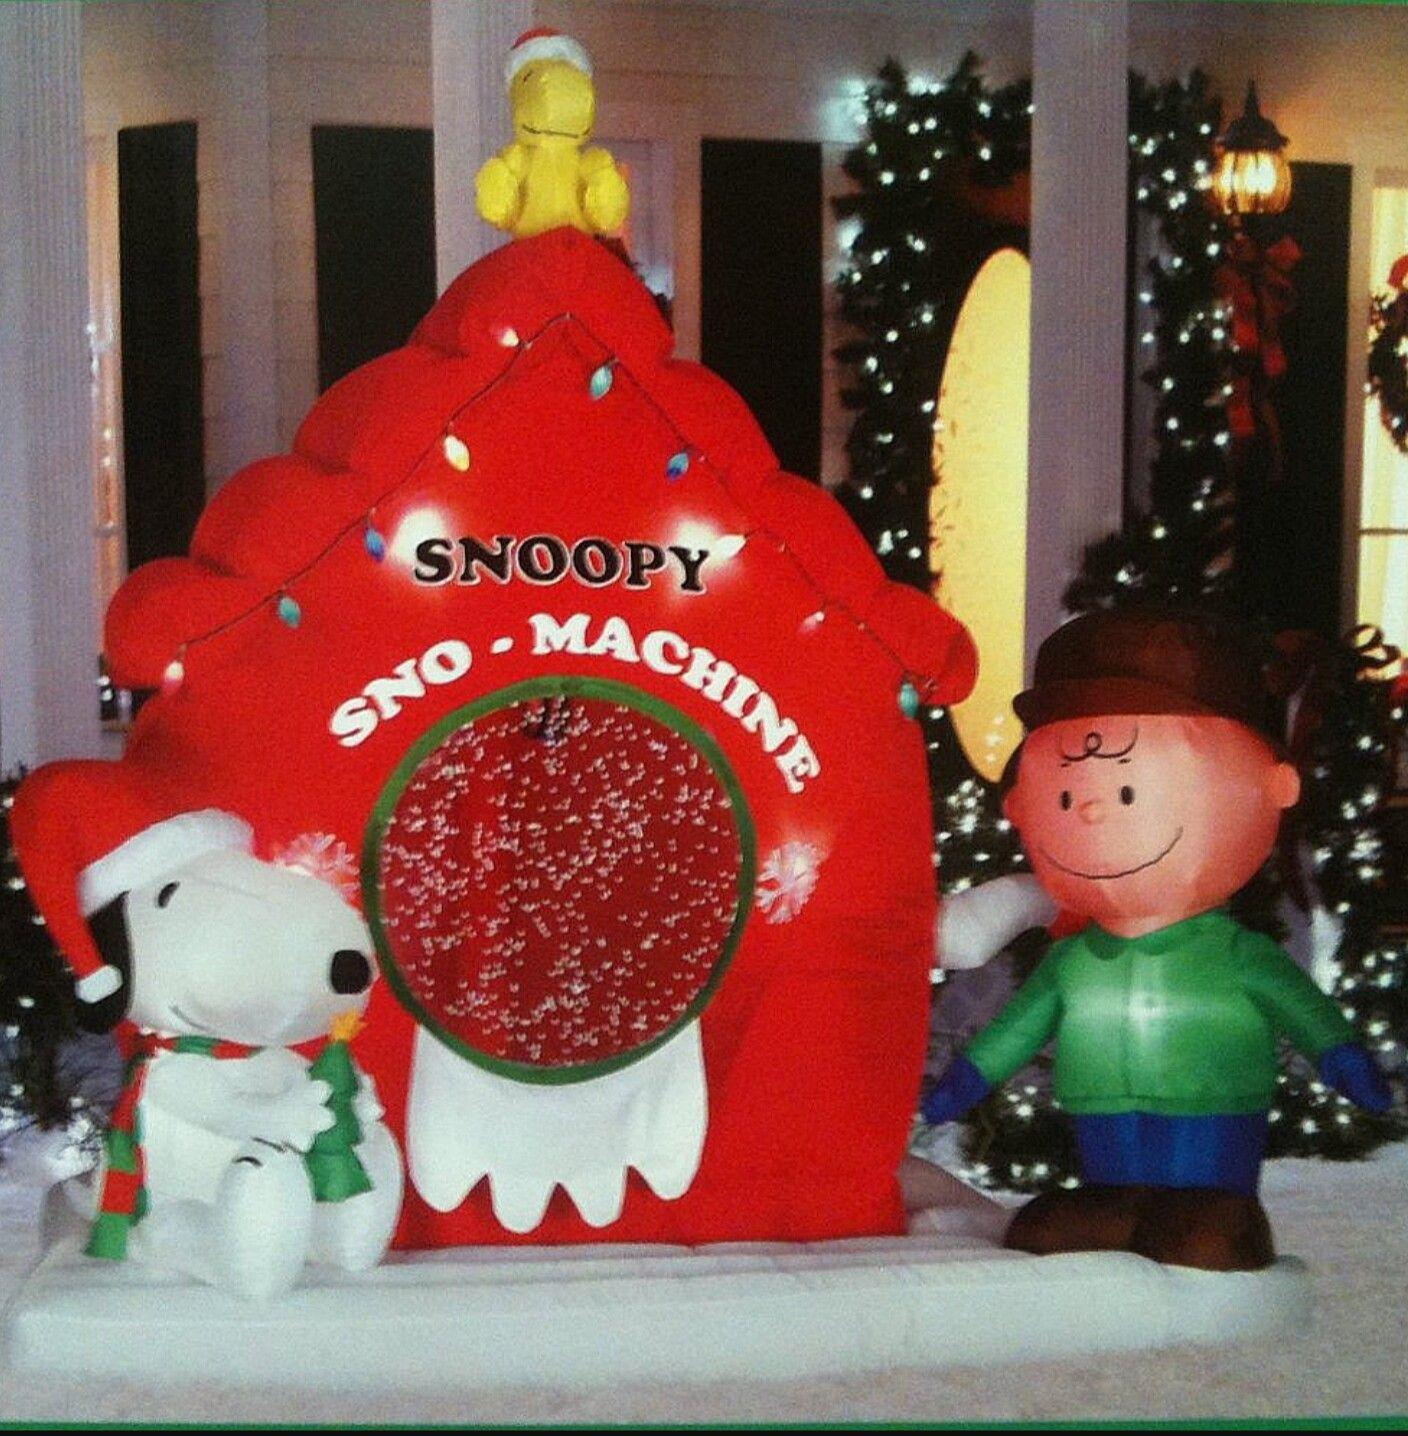 Peanuts Christmas inflatable yard decorations